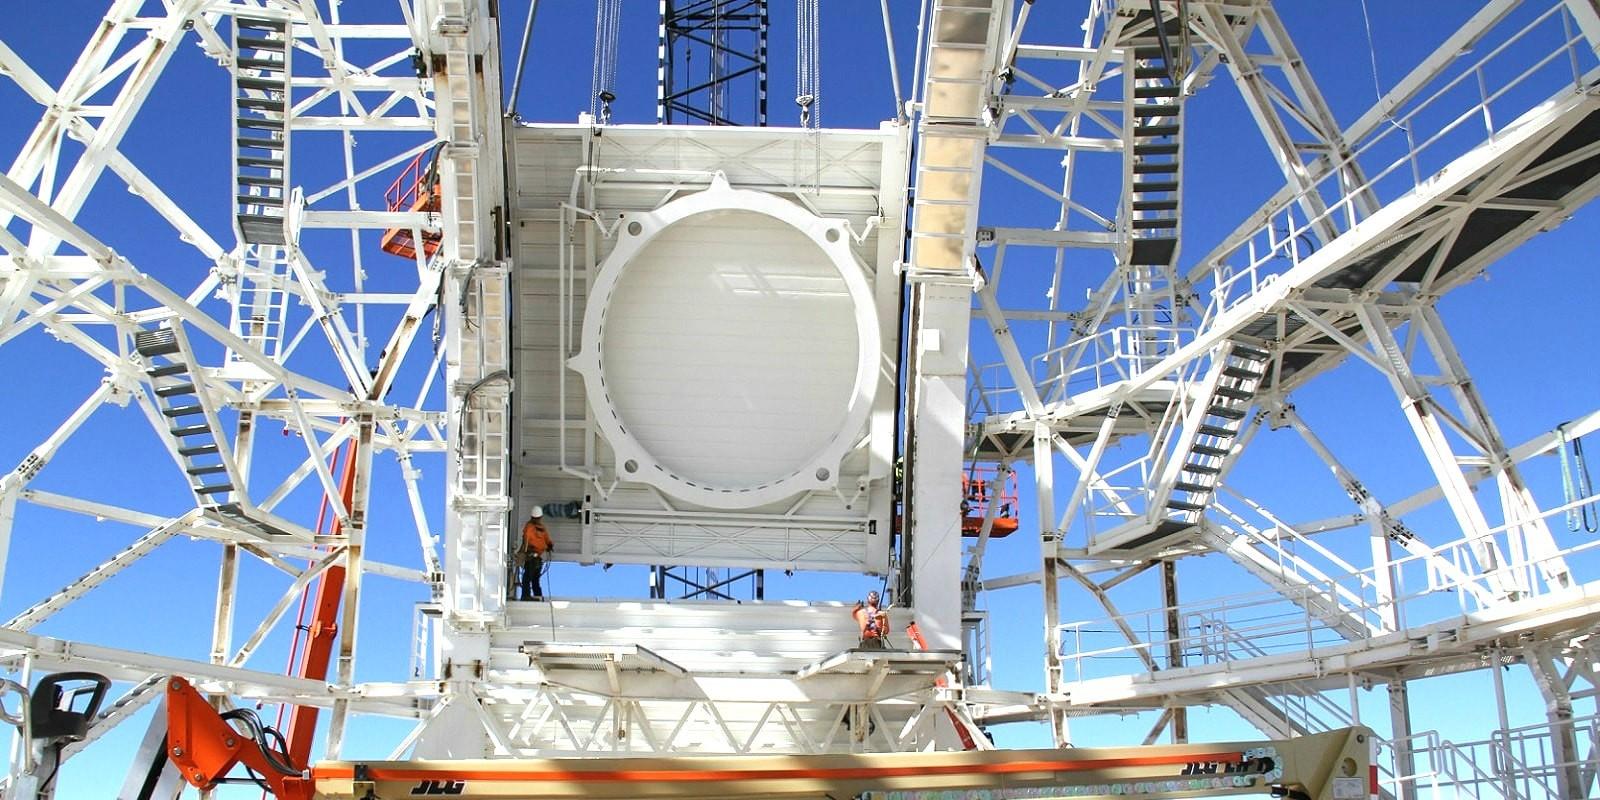 DKIST_Solar_Telescope_ATST_Maui_Hawaii_Idom_ADA_01